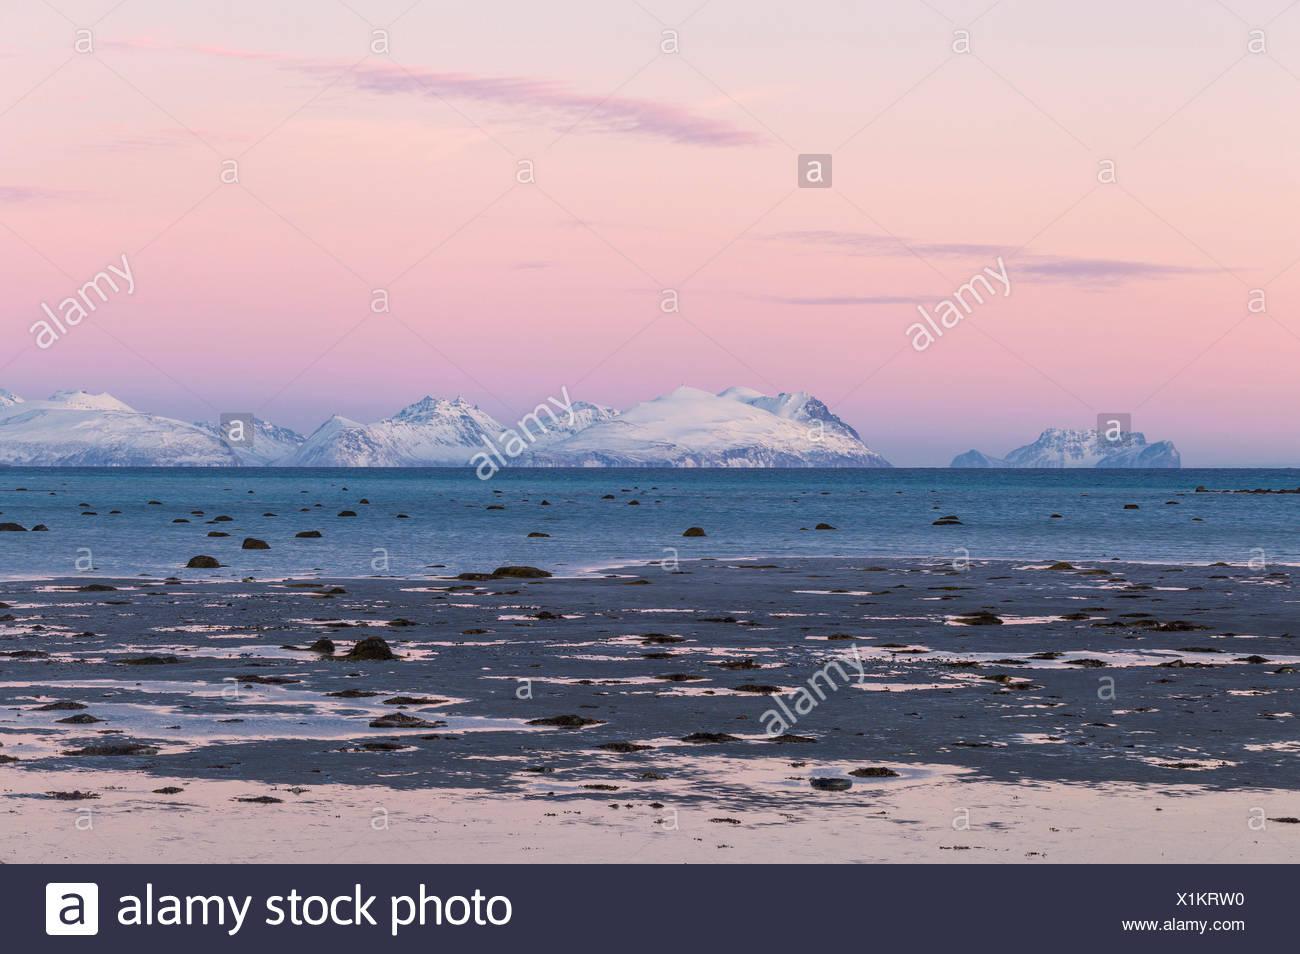 The colors of sunset illuminate the shoreline at low tide. Spaknesora naturreservat, Djupvik, Lyngenfjord, Lyngen Alps, Troms, Norway, Lapland, Europe. - Stock Image